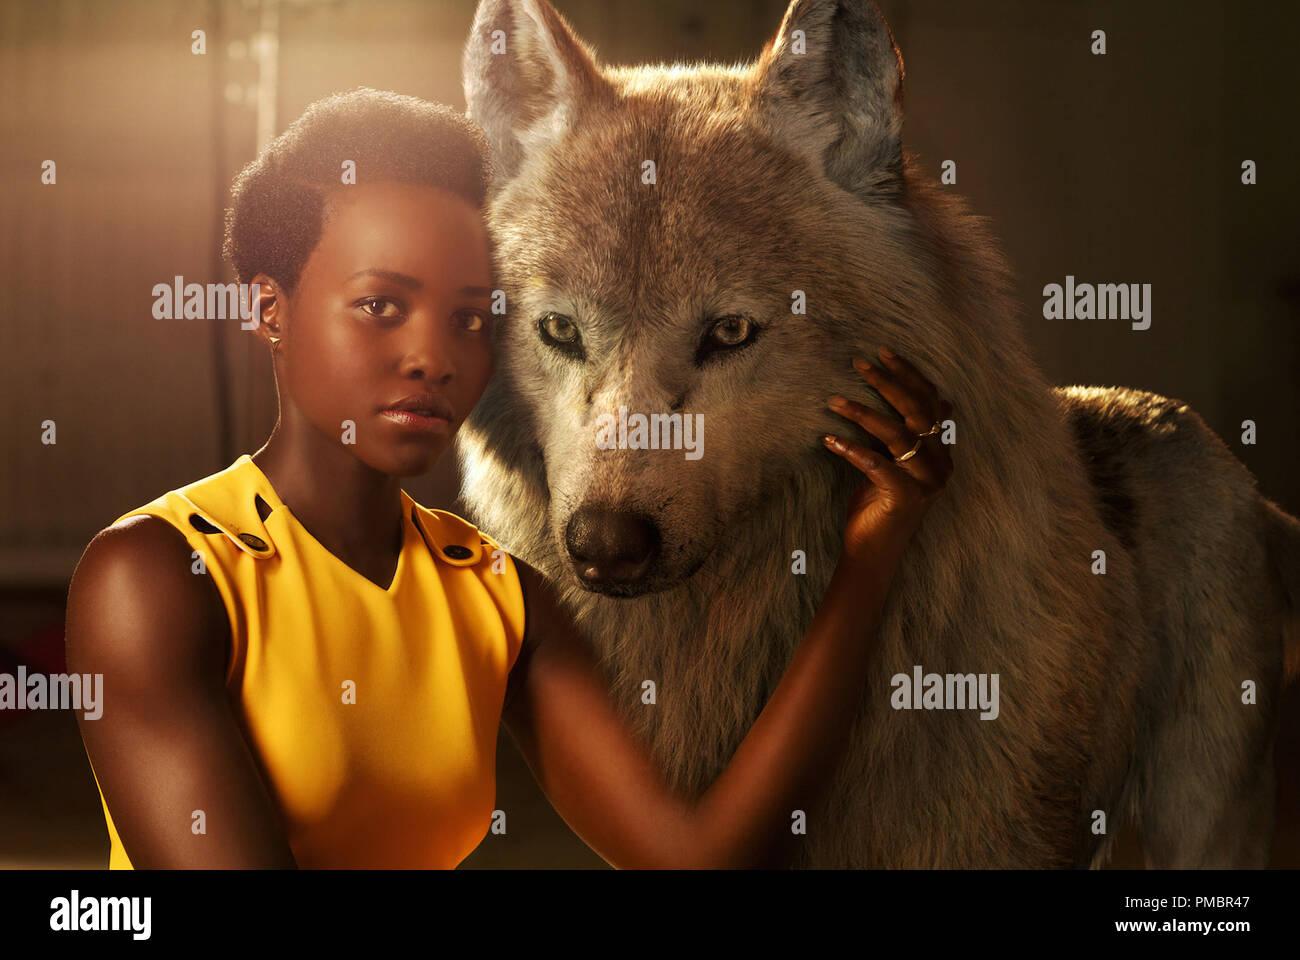 THE JUNGLE BOOK - Lupita Nyong'o voices Raksha, a mother